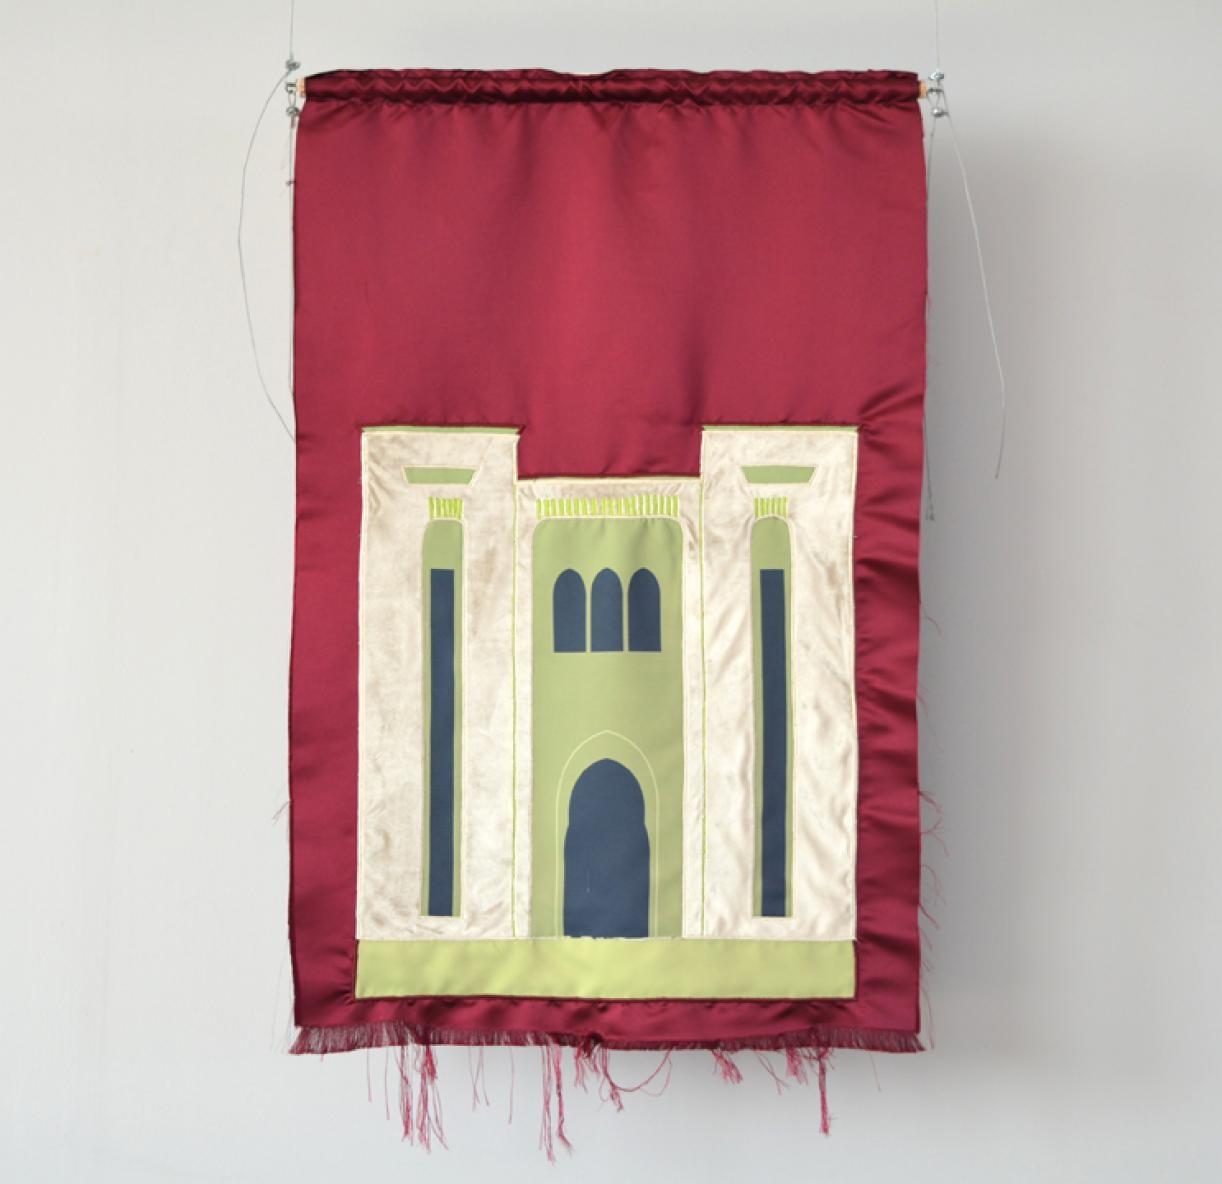 Blazon: Nijmeh, Parliament, 2015, Embroidery and applique on textile, 112 x 74 cm, Ed. 3 + 2 AP